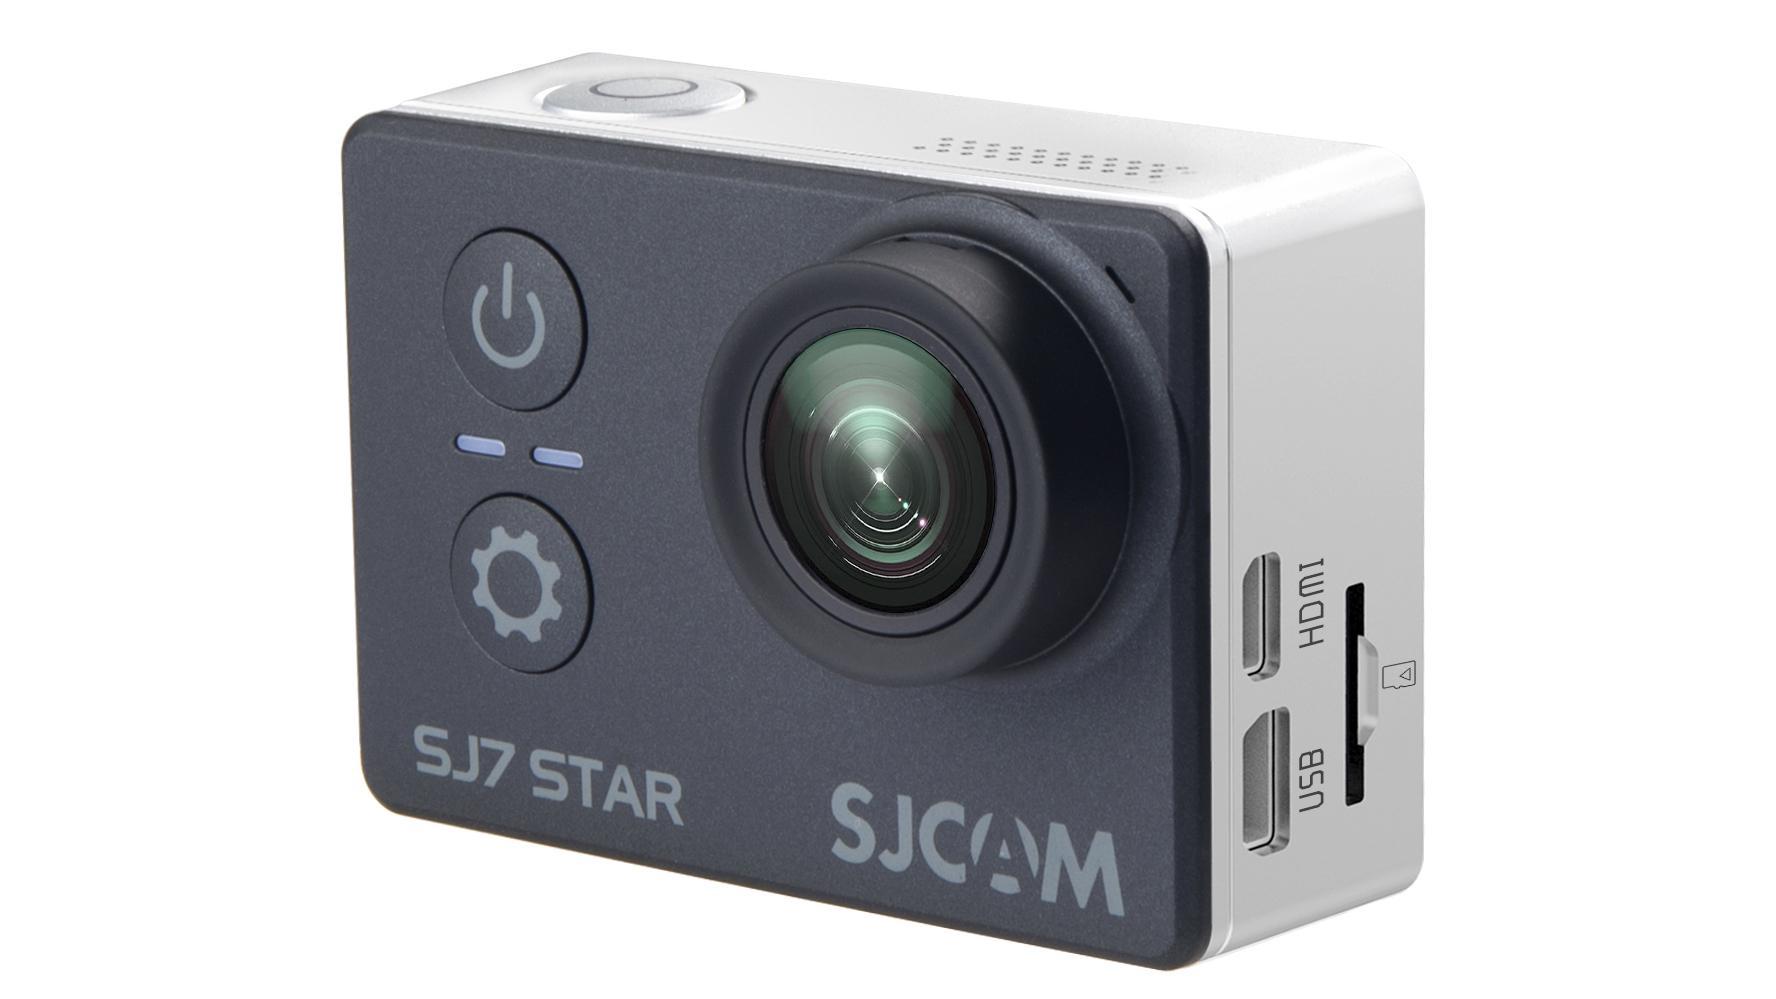 SJCAM SJ7 Star 4k